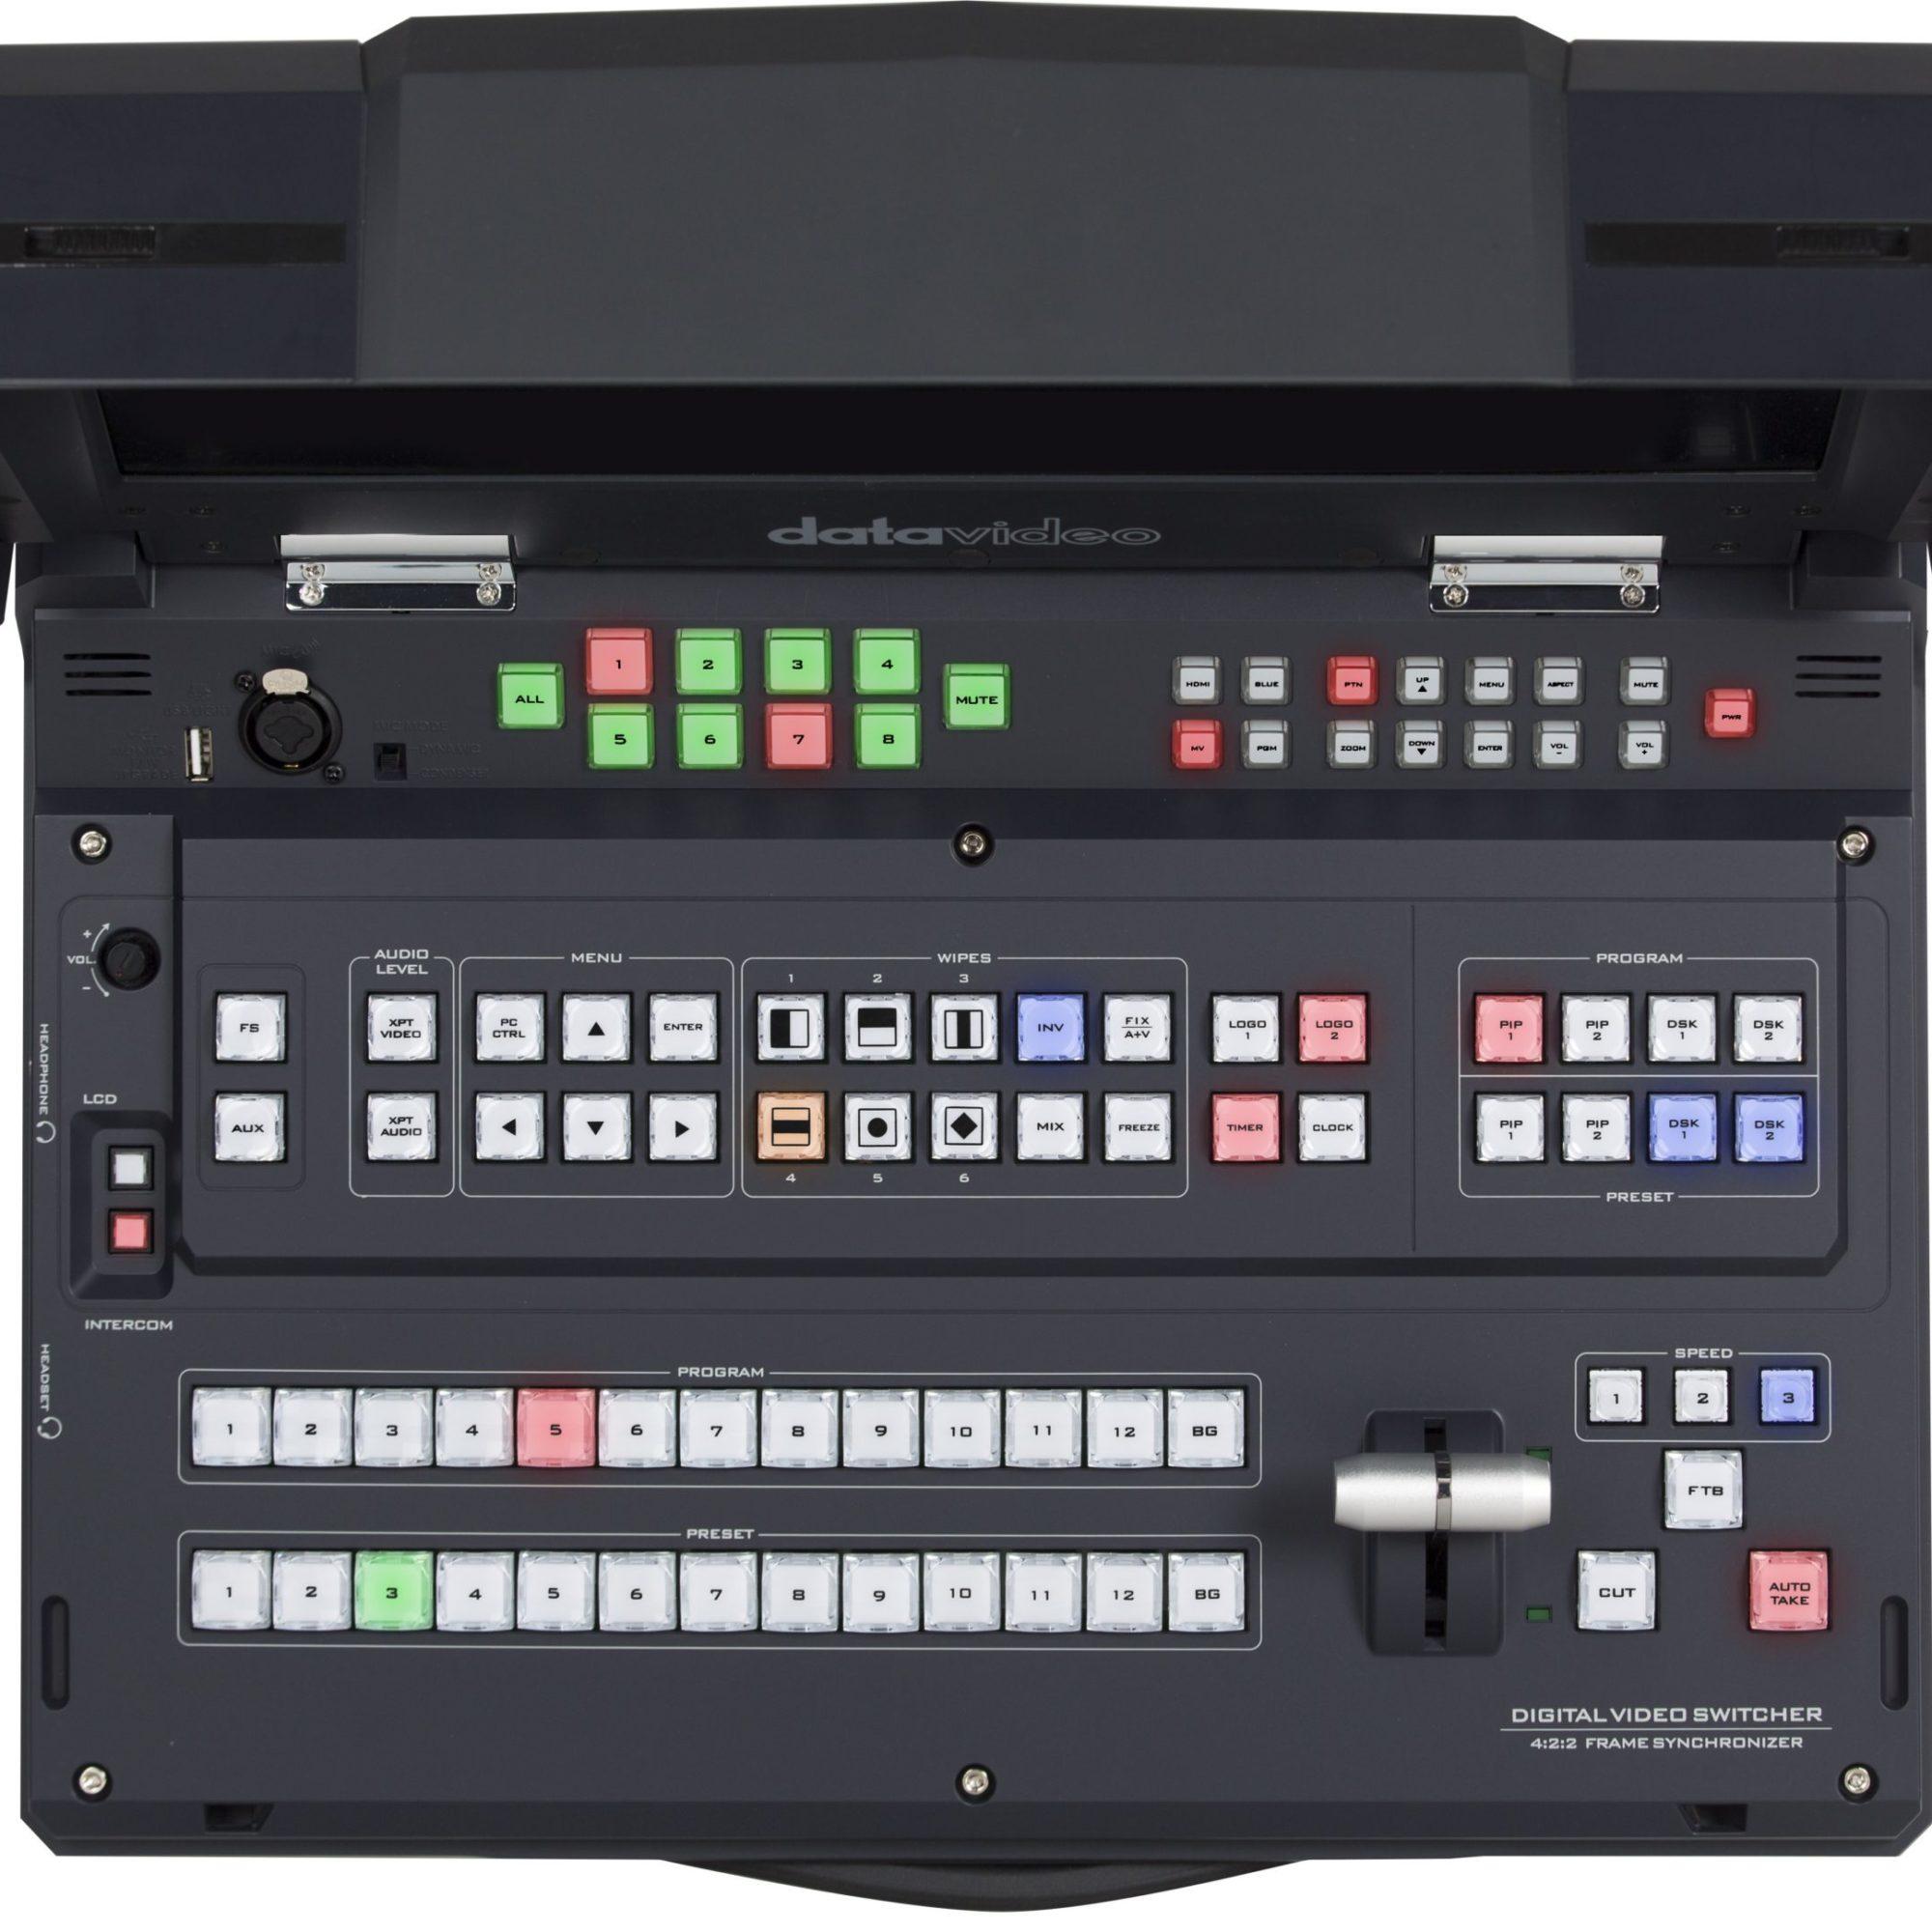 HS-2850-12 Datavideo Studio vidéo portable HD / SD 12 canaux